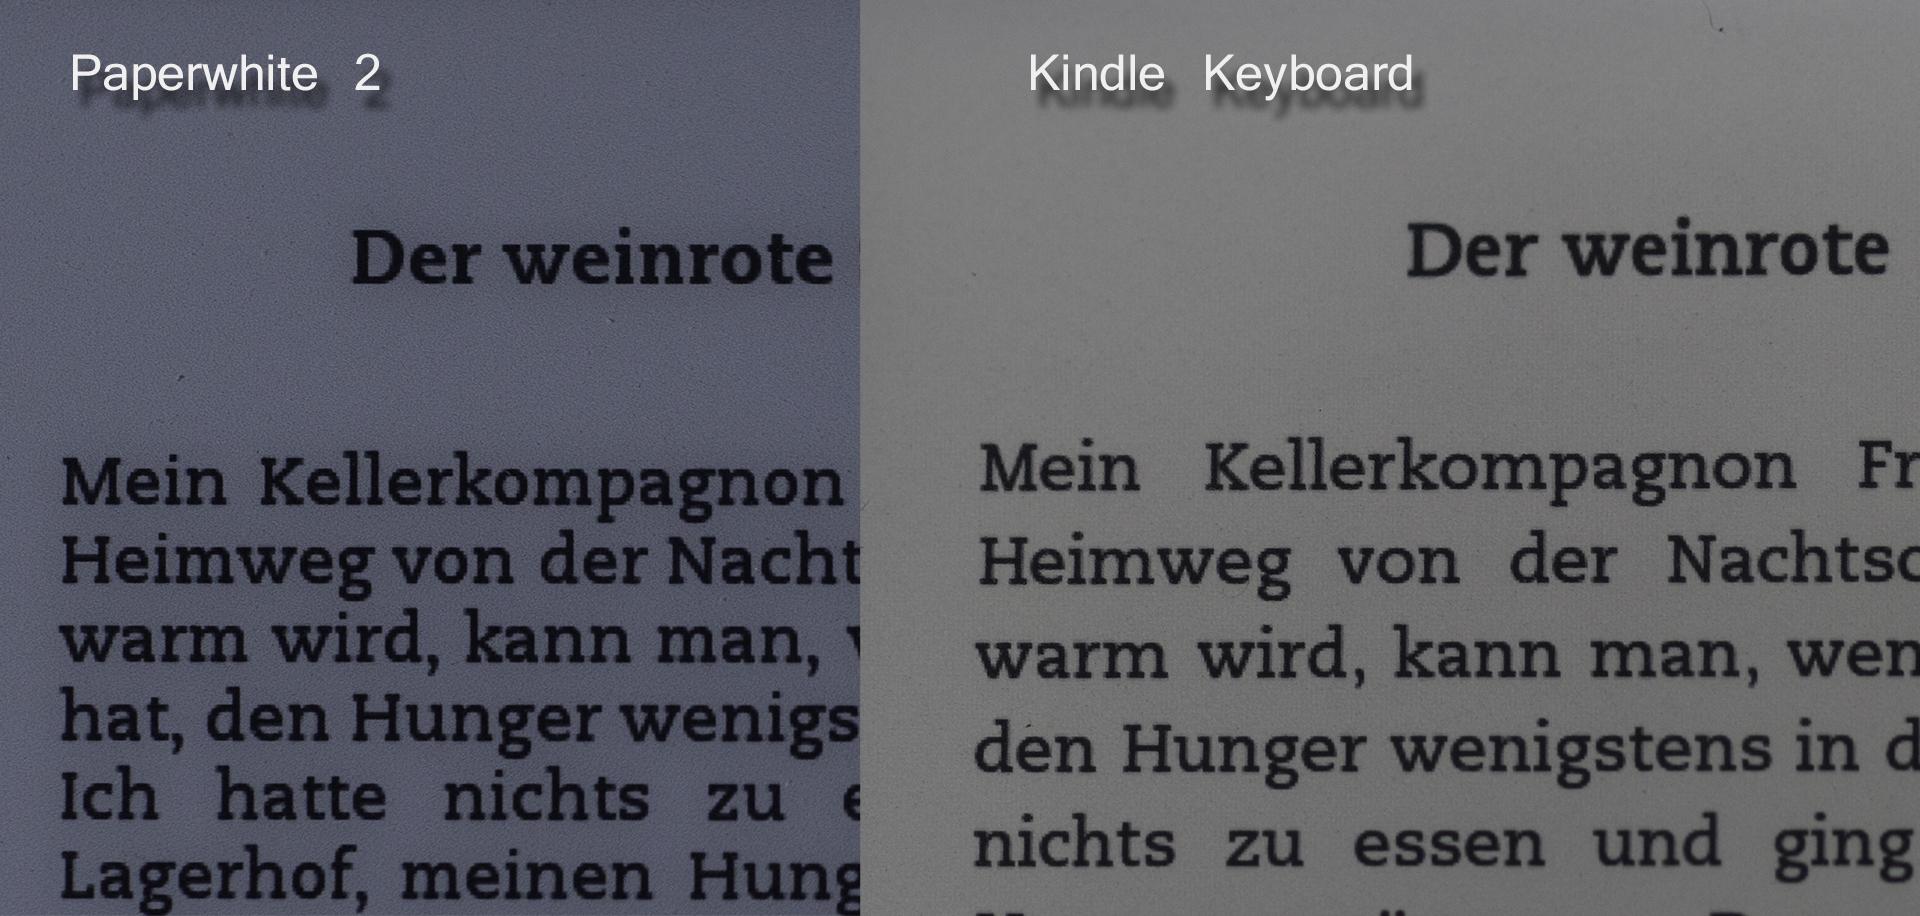 Kindle Vergleich1920